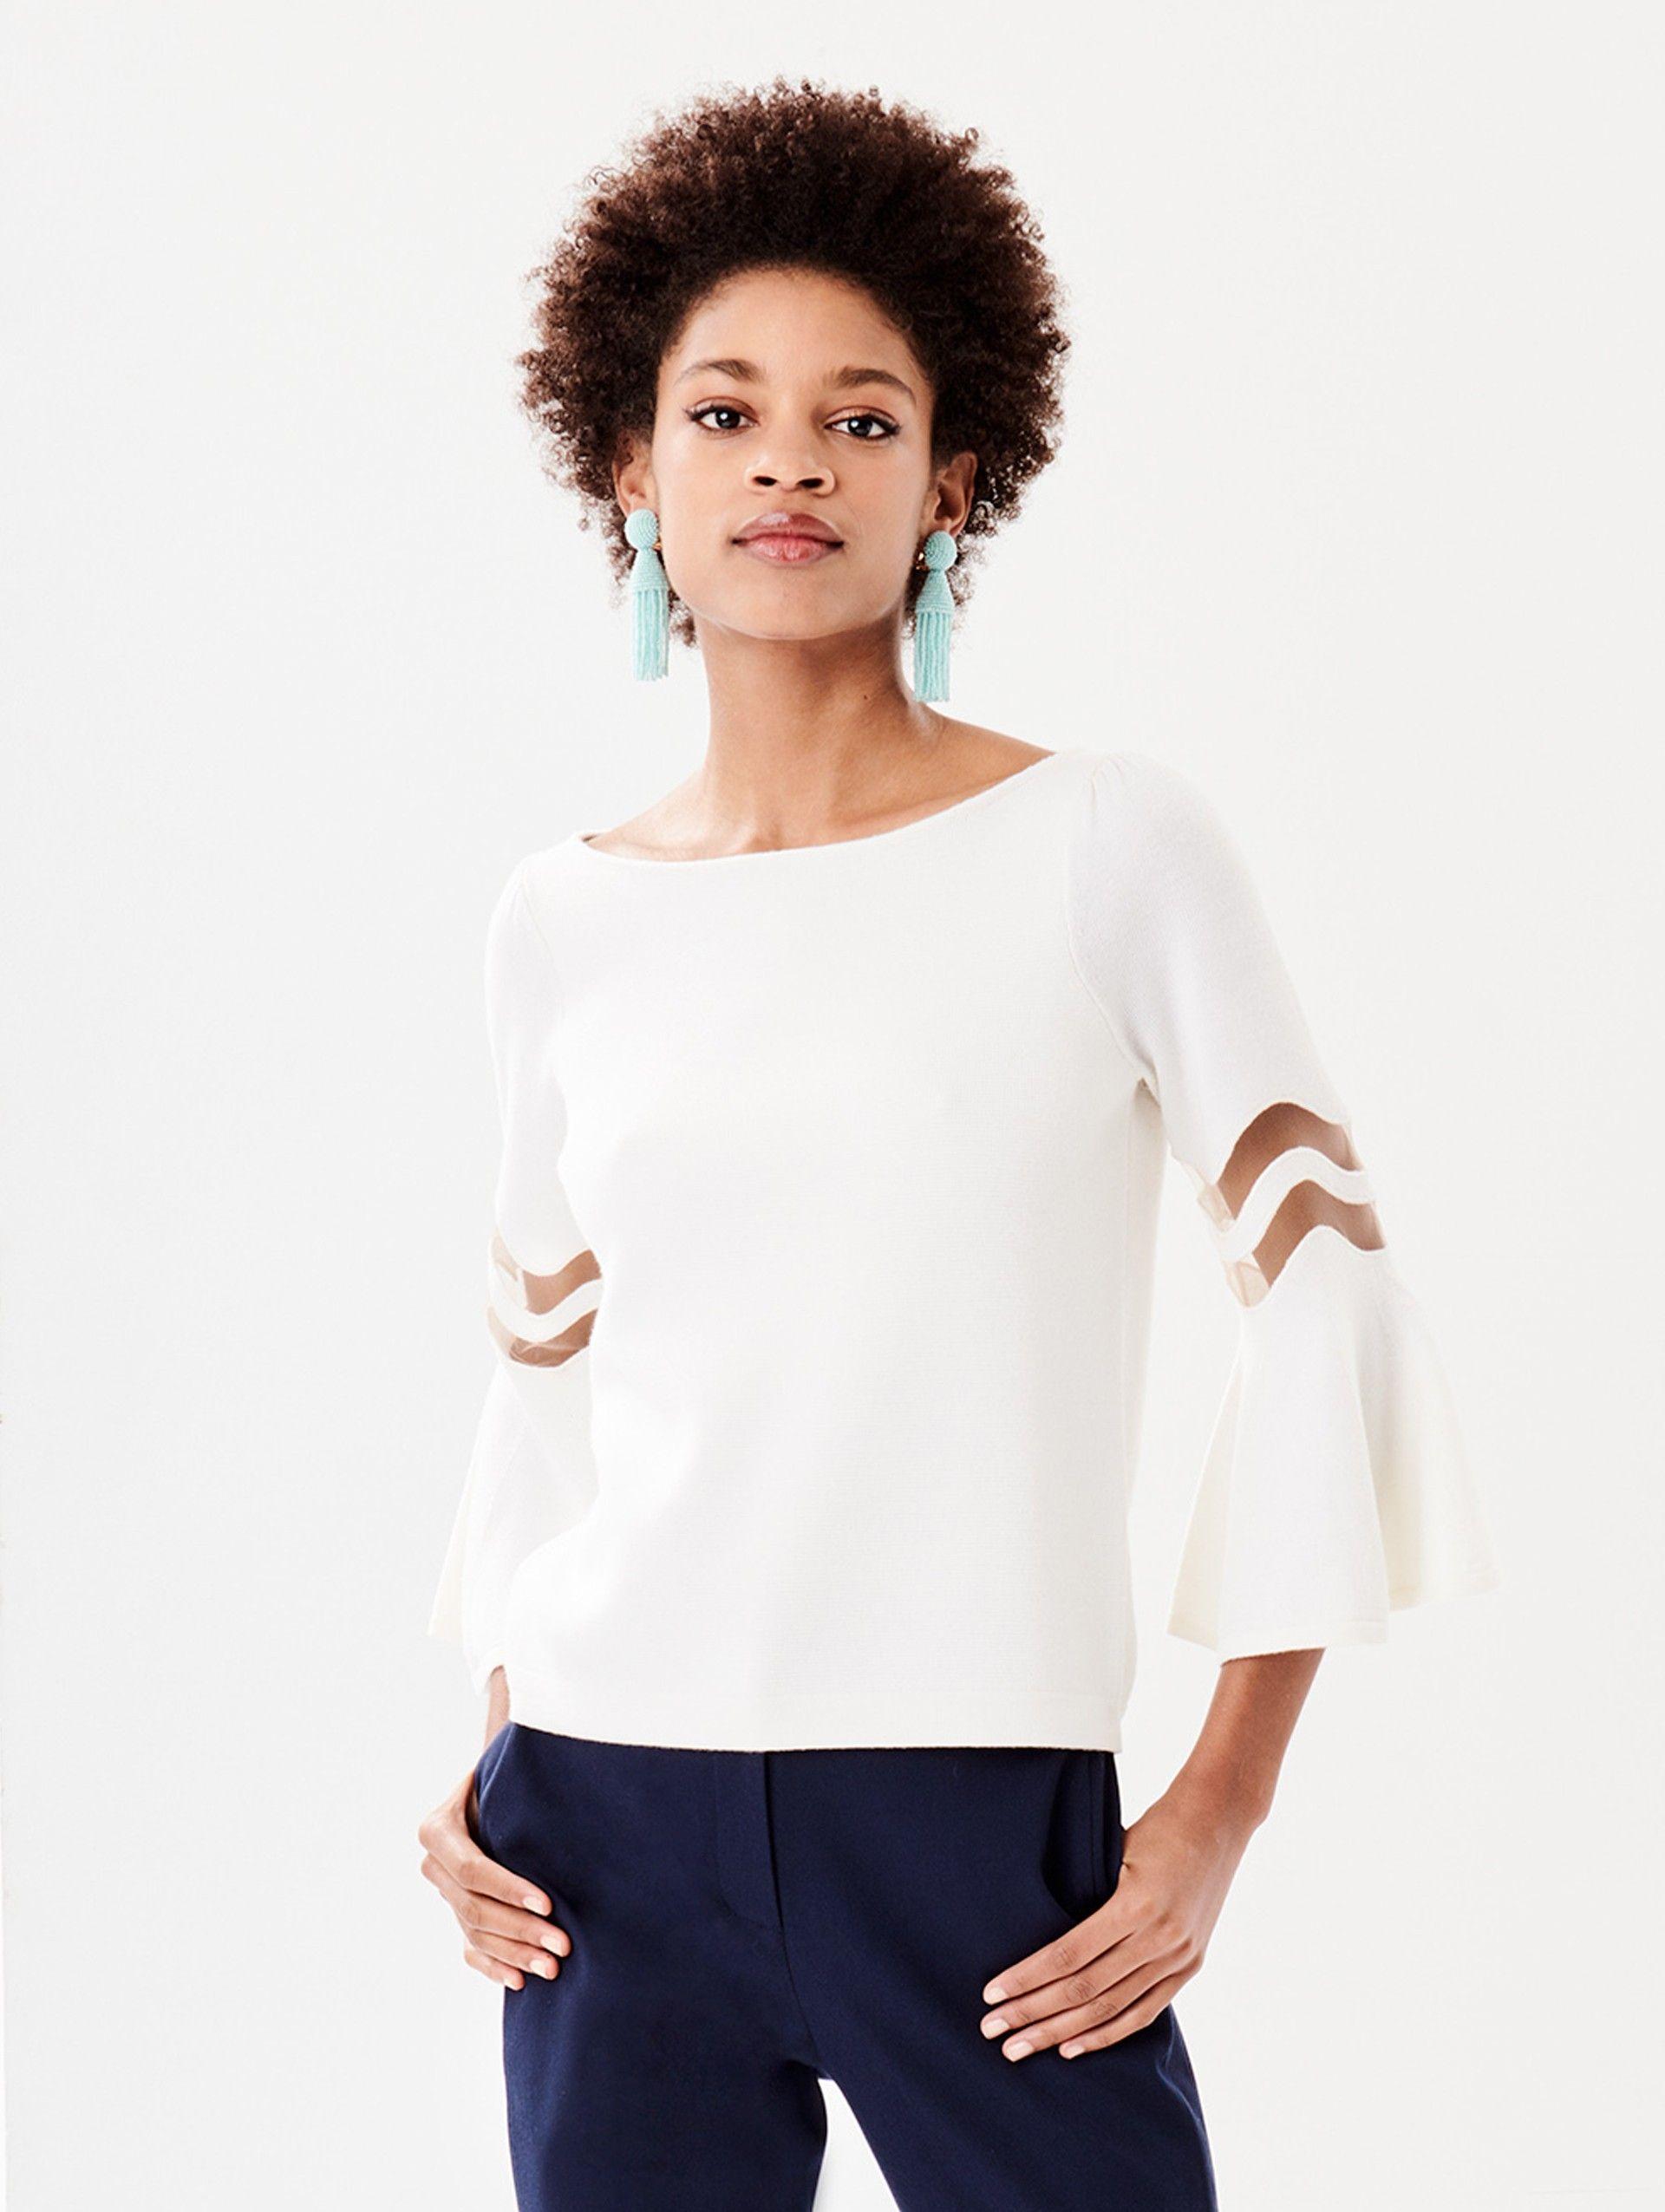 f08a26b4bd4def ... Blouses & Knits collection and designer fashion at the official ODLR  website. Oscar de la Renta - Flutter-Sleeve Pullover